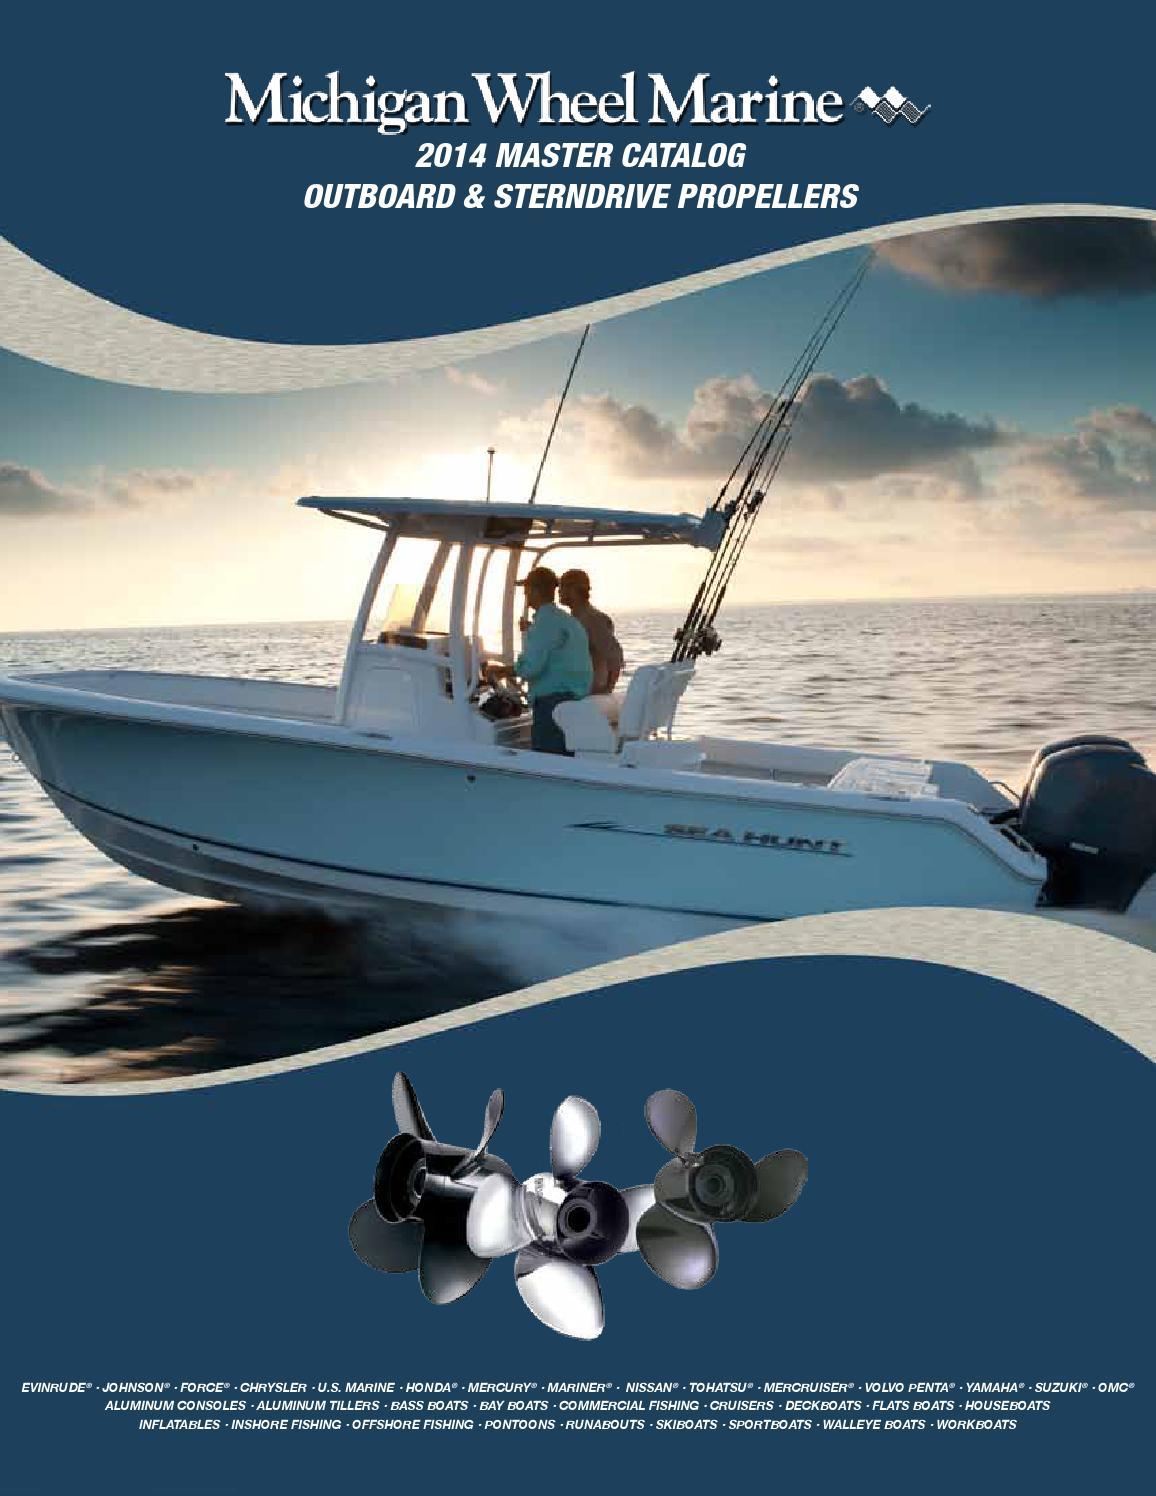 2014 Michigan Wheel Obsd Propeller Catalog By Titan Marine Issuu 2000 Yamaha T50 Outboard Wiring